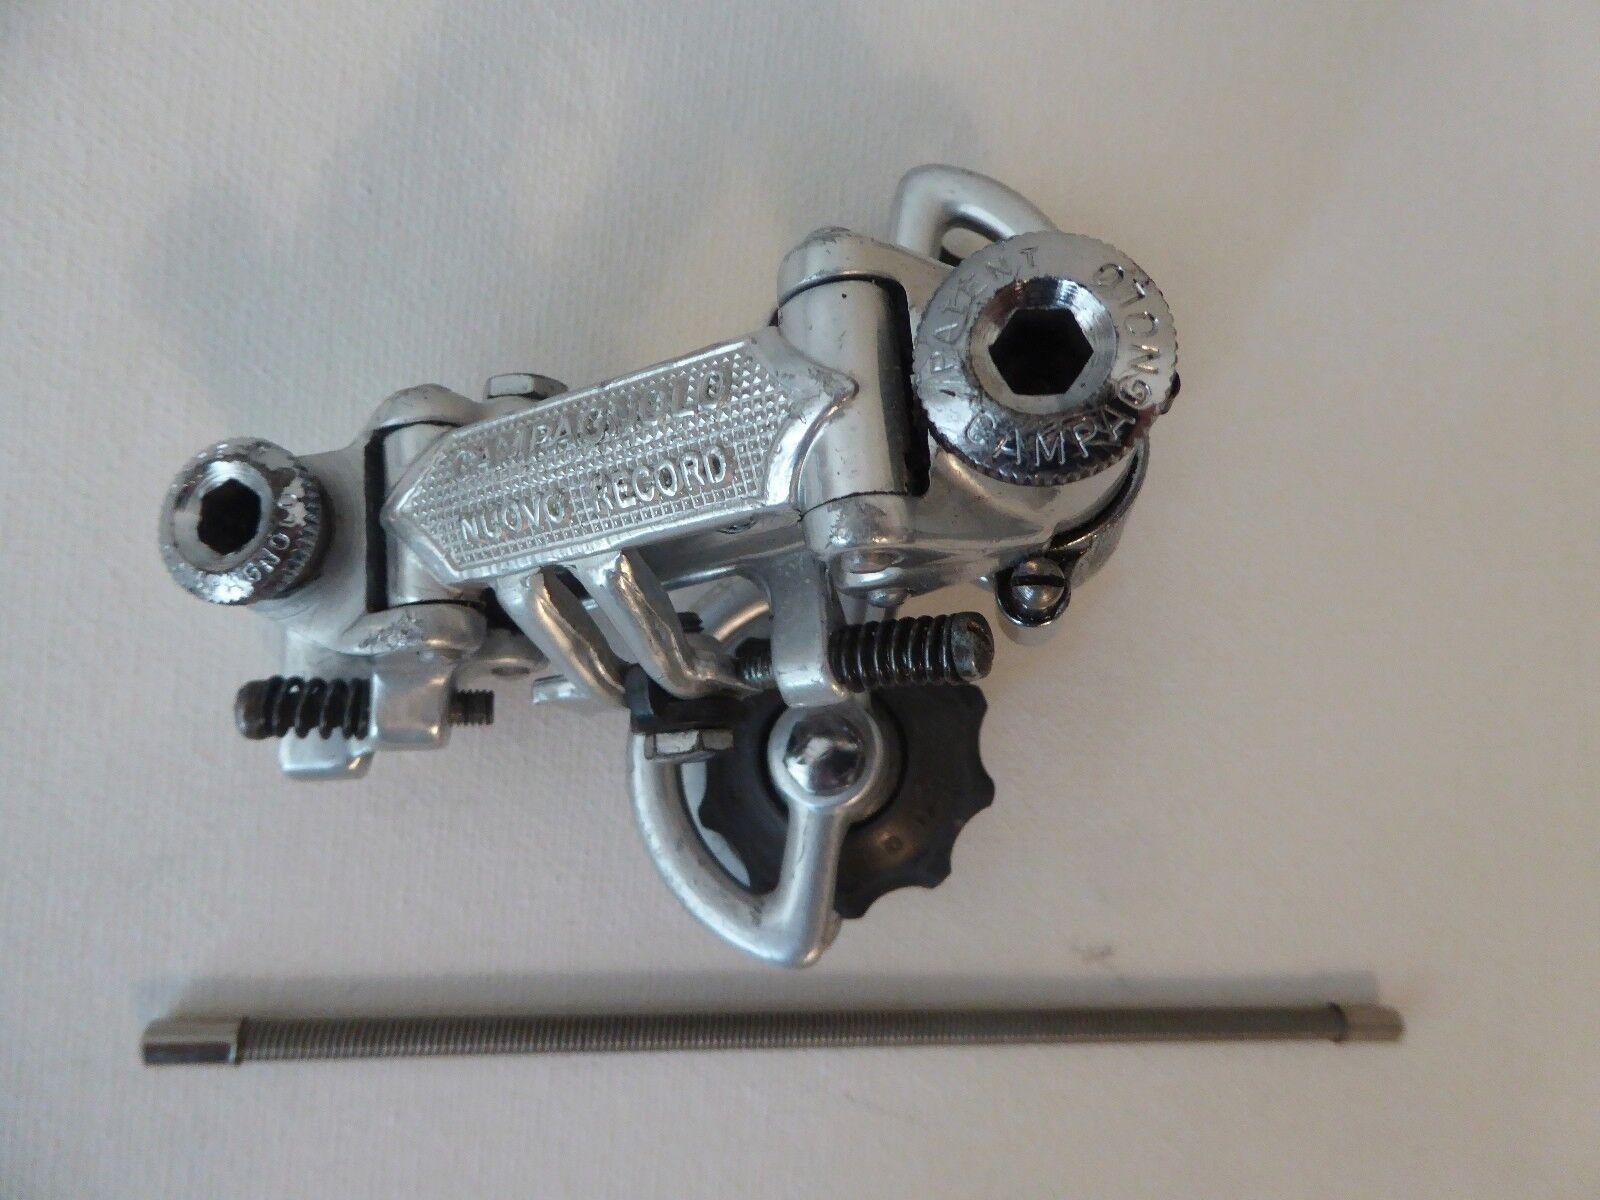 Vintage Campagnolo Nuovo Rekord hinten Derailleur Patent 76 plus NOS Außenkabel